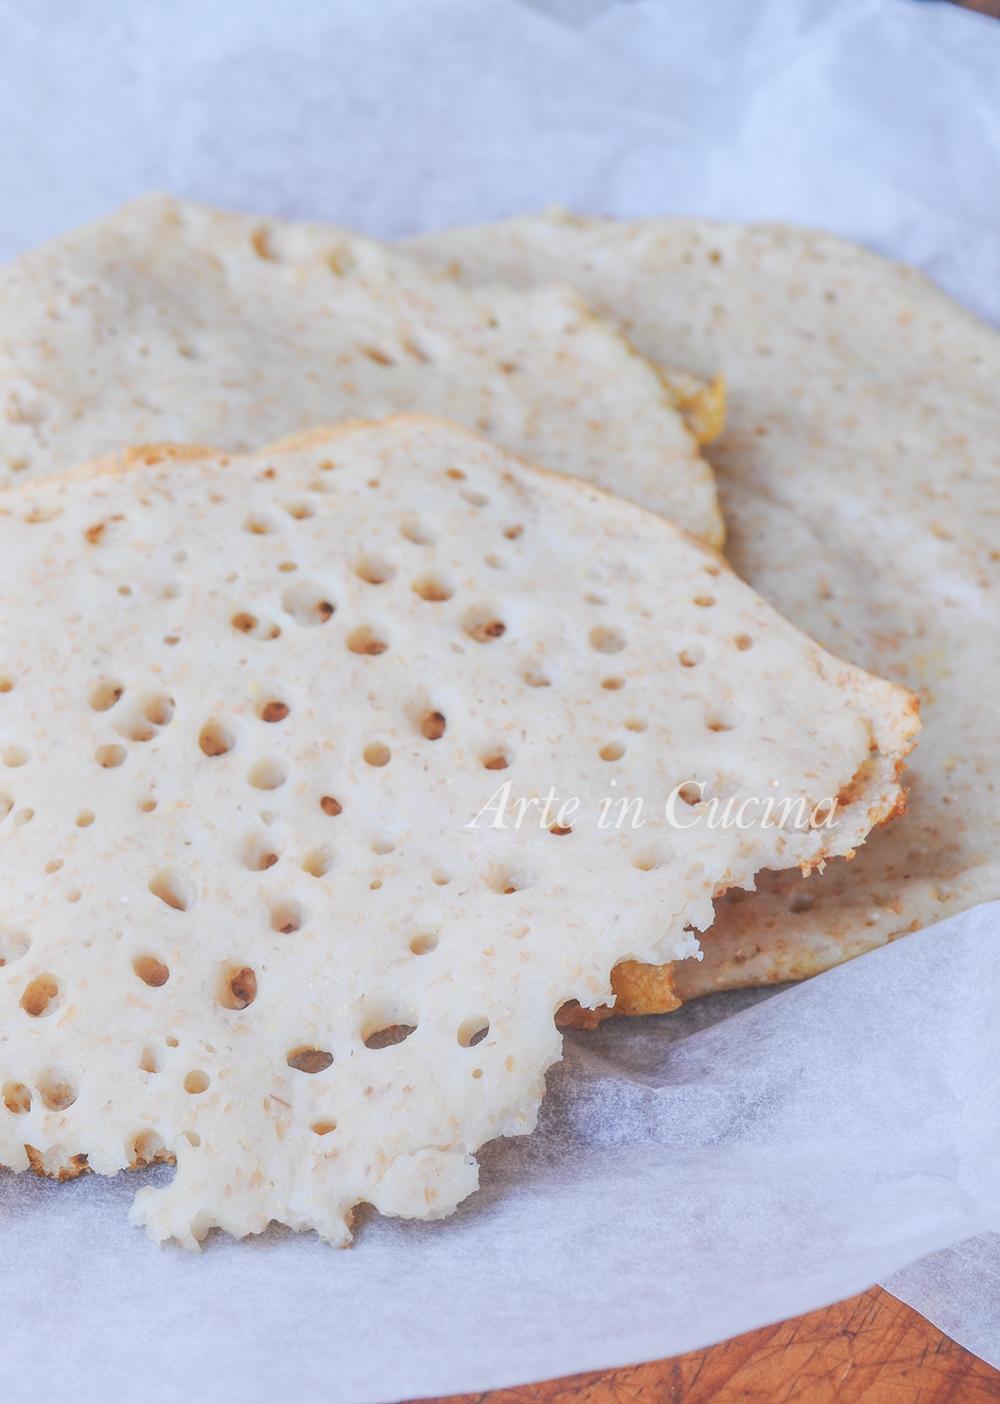 Pane injera ricetta africana Eritrea facile vickyart arte in cucina